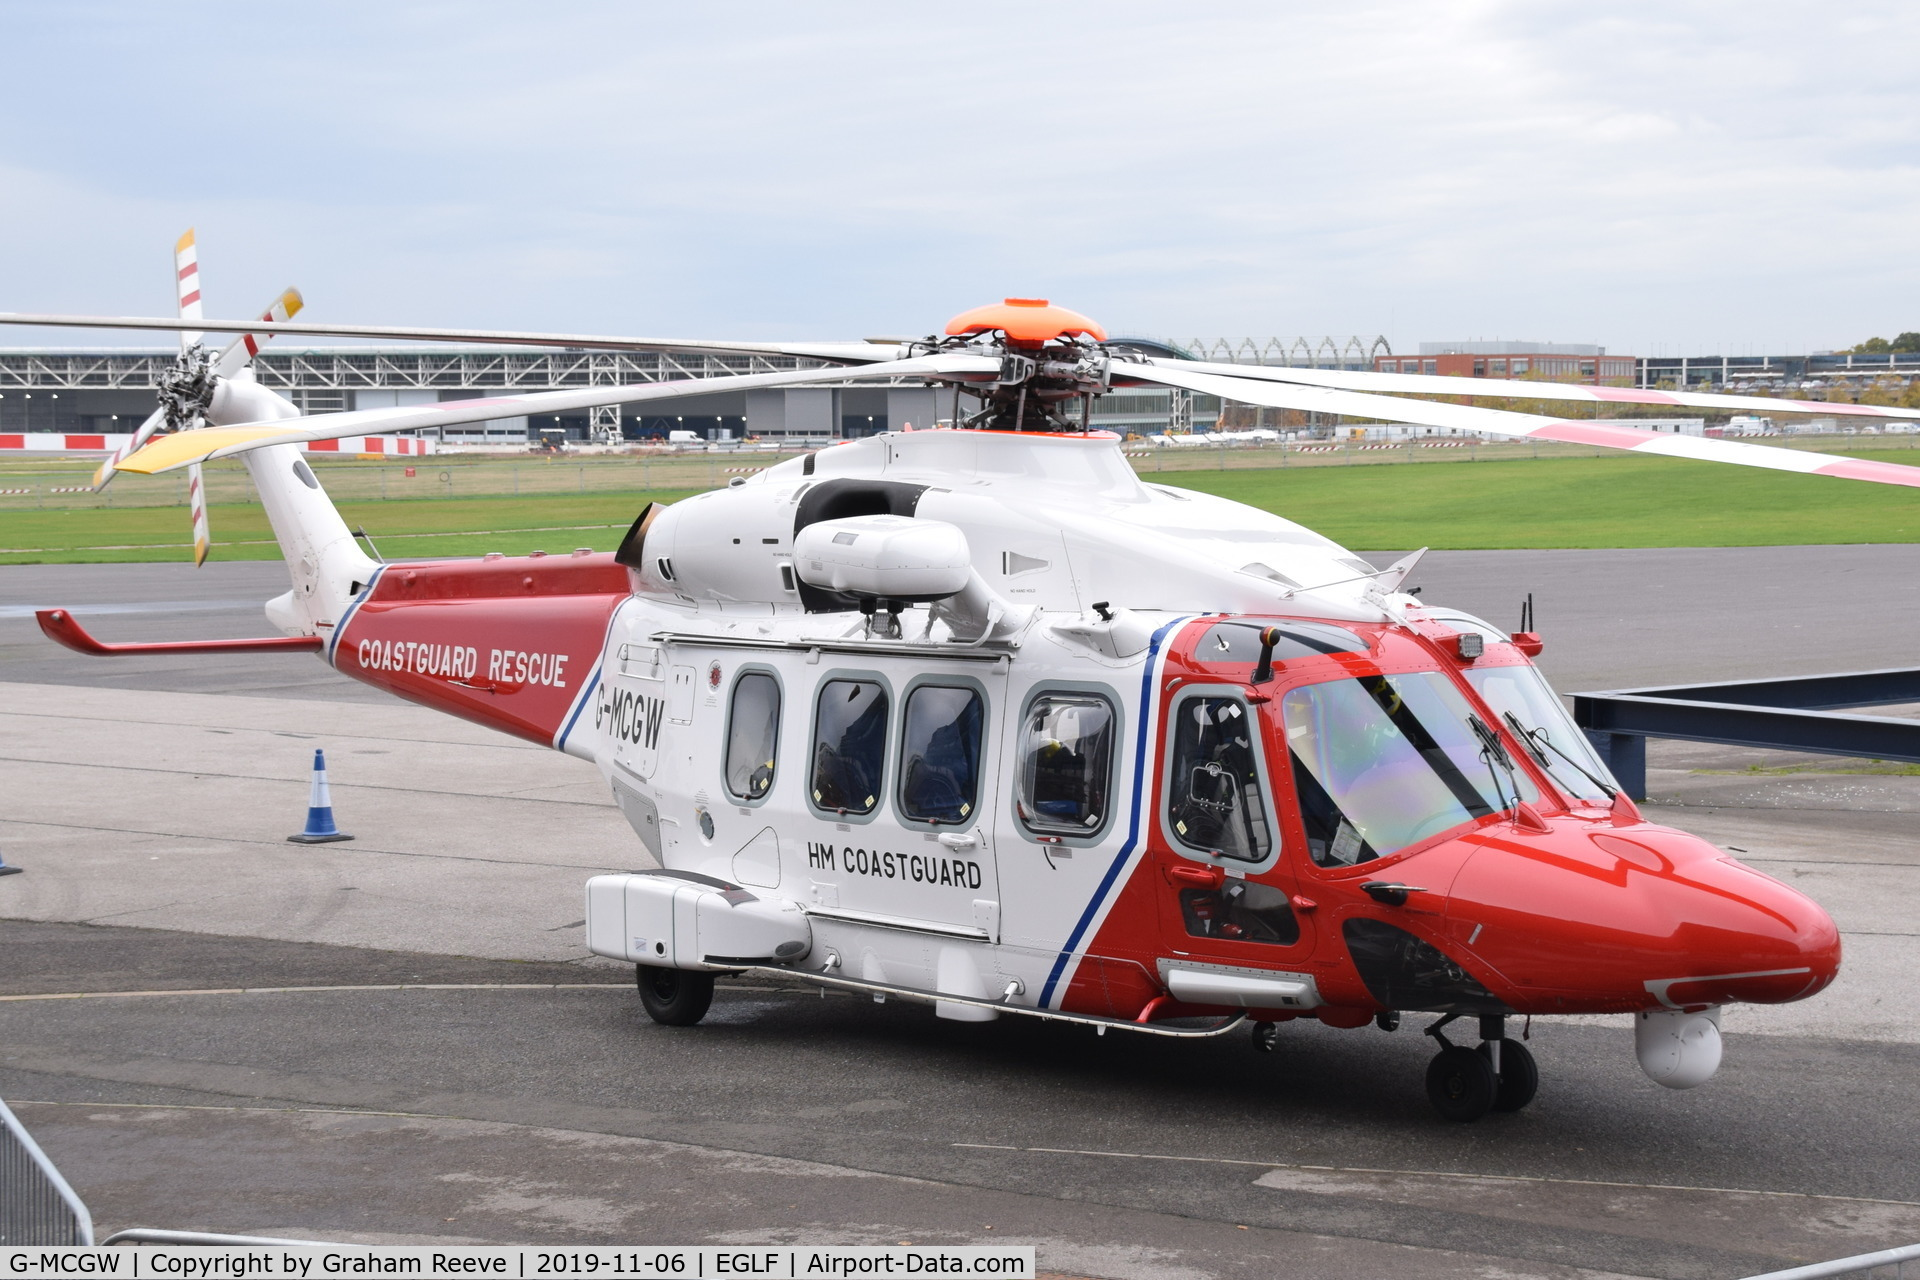 G-MCGW, 2018 Leonardo AW189 C/N 92009, On display at, Vertical Flight Expo - 2019.